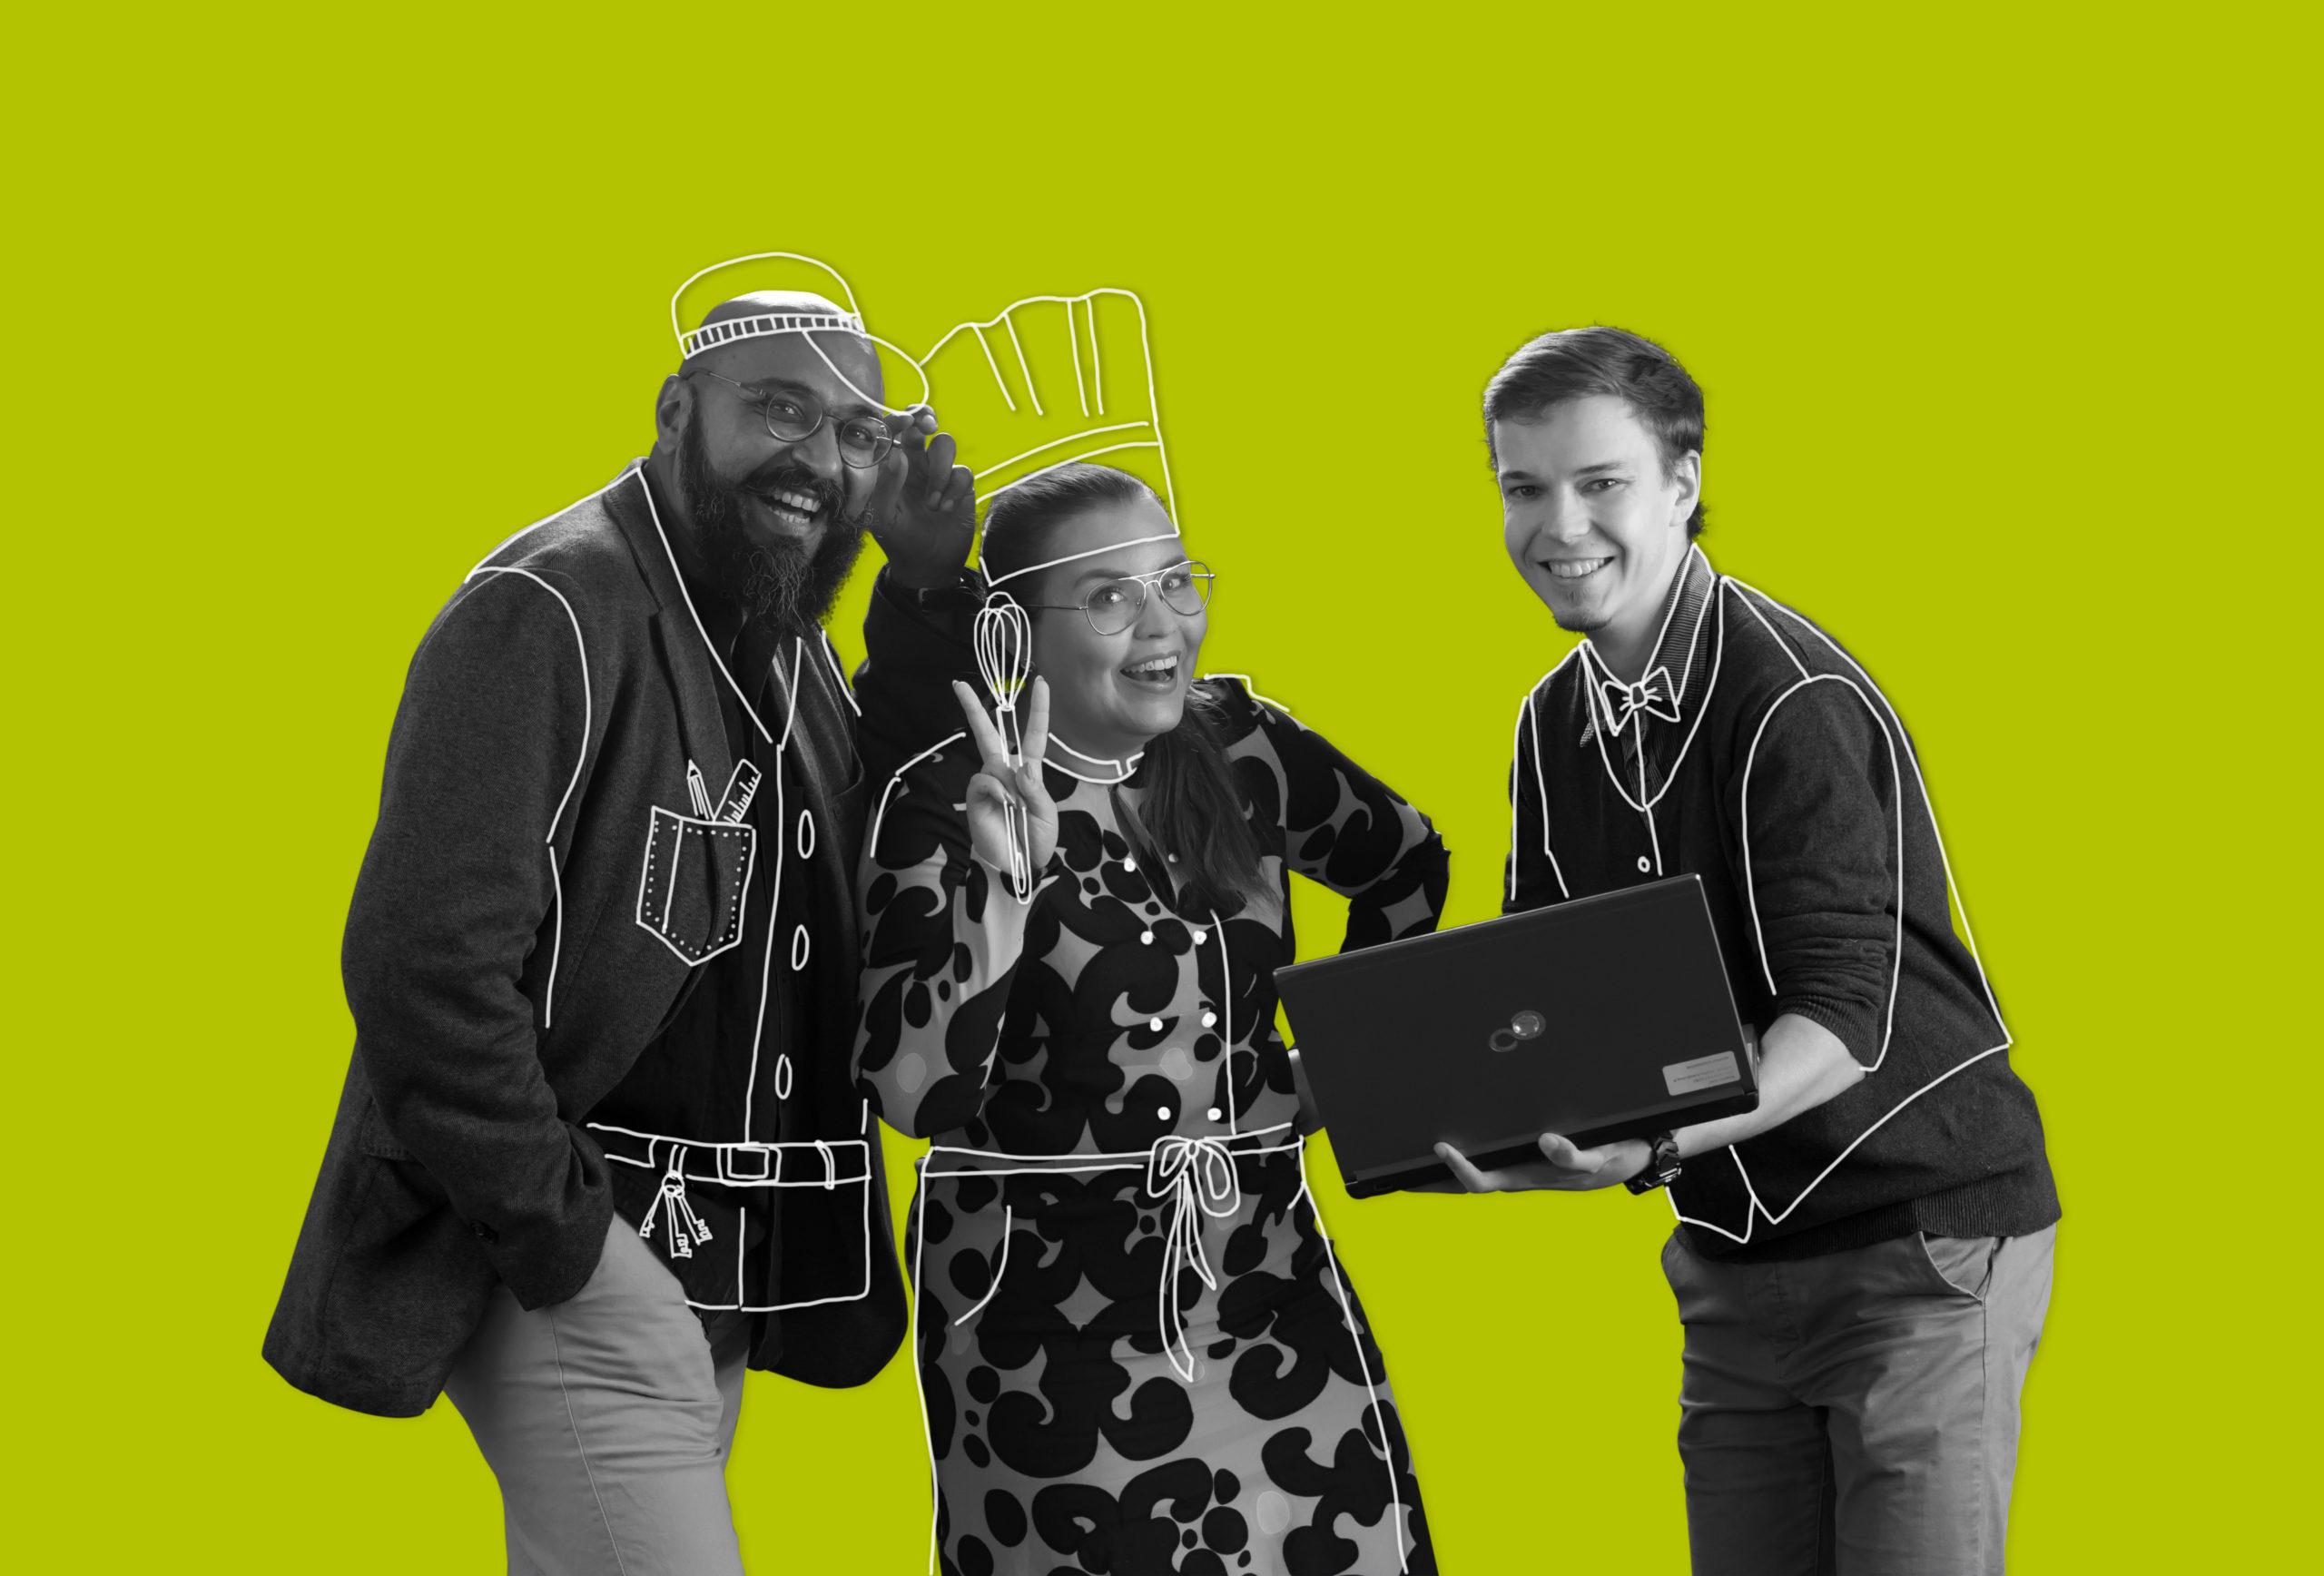 Seure – A renewal of digital services